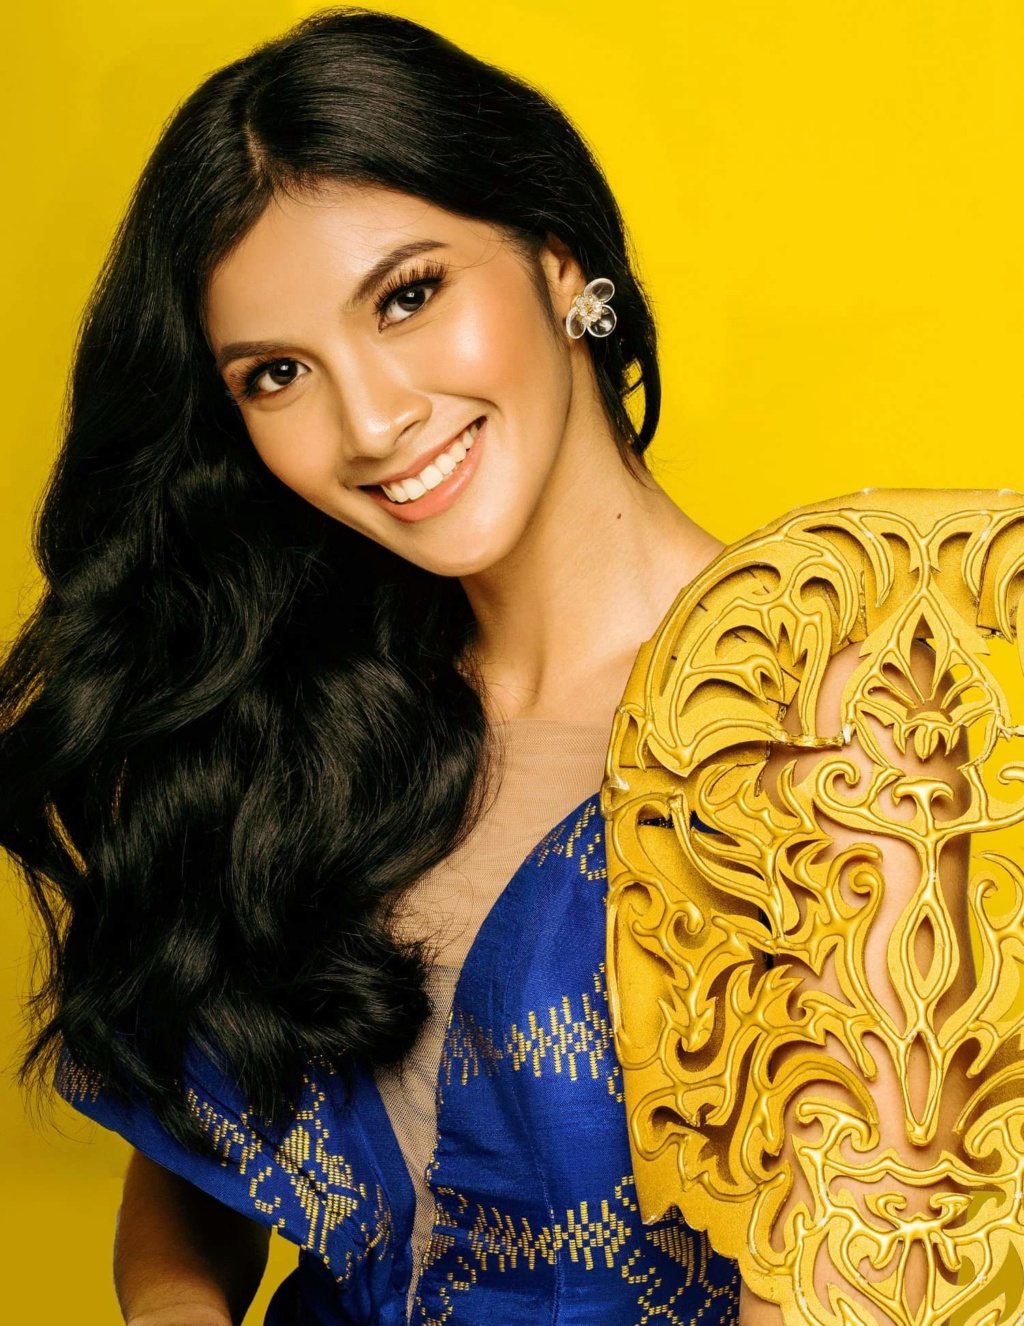 Reina Hispanoamericana Filipinas 2019: Katrina Llegado Fb_10615